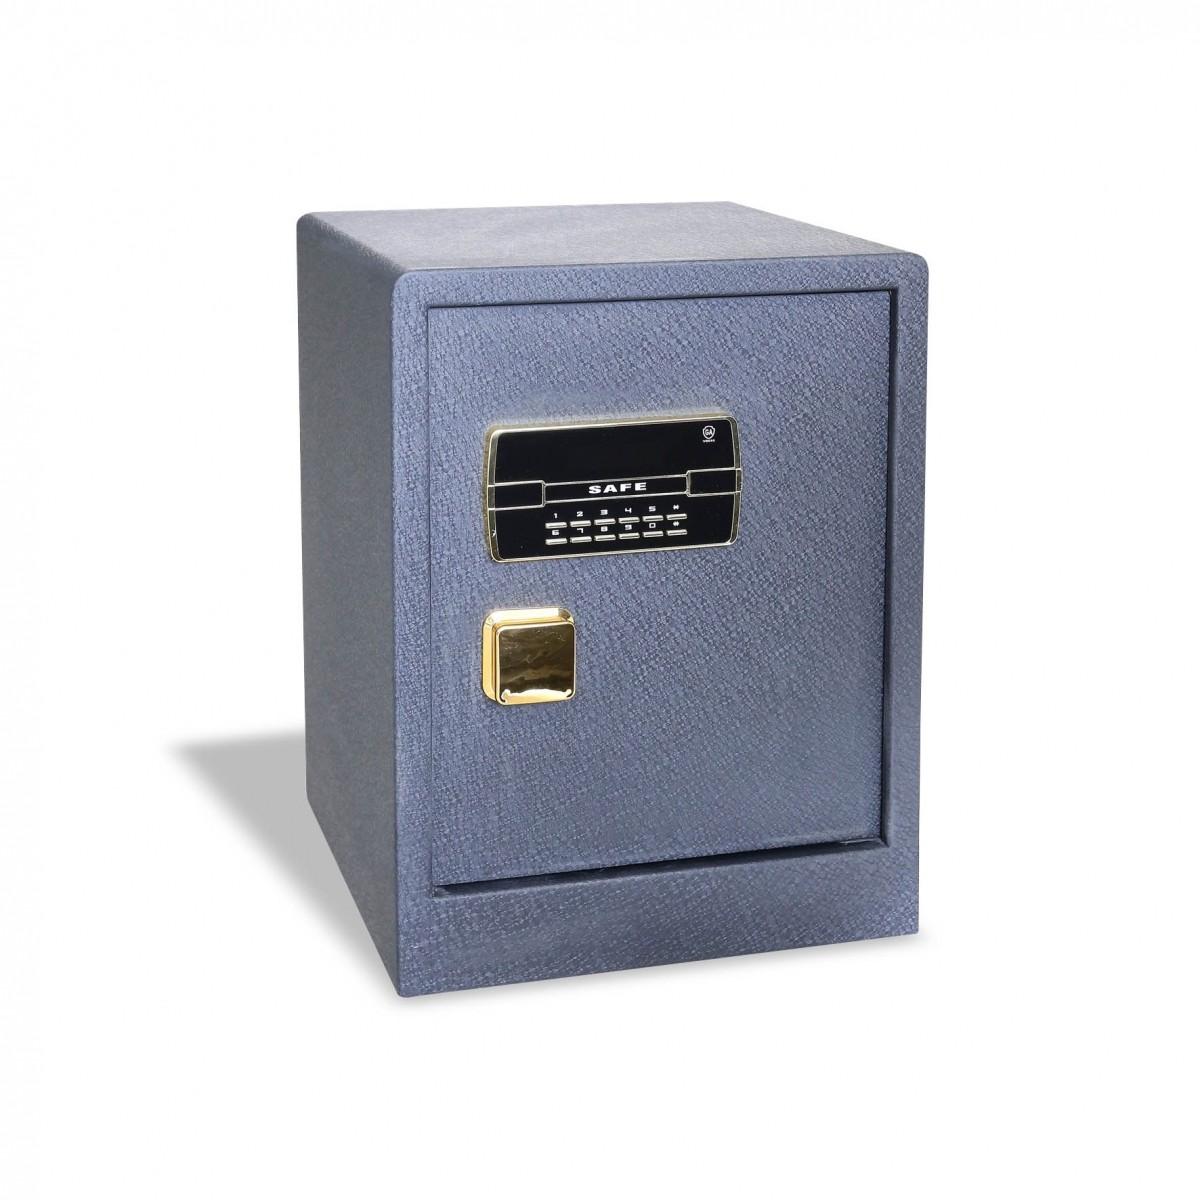 Cofre Safewell Burglary Safe AD42BN, Dimensões 430 X 388 X 330 MM, espessura 2-10mm